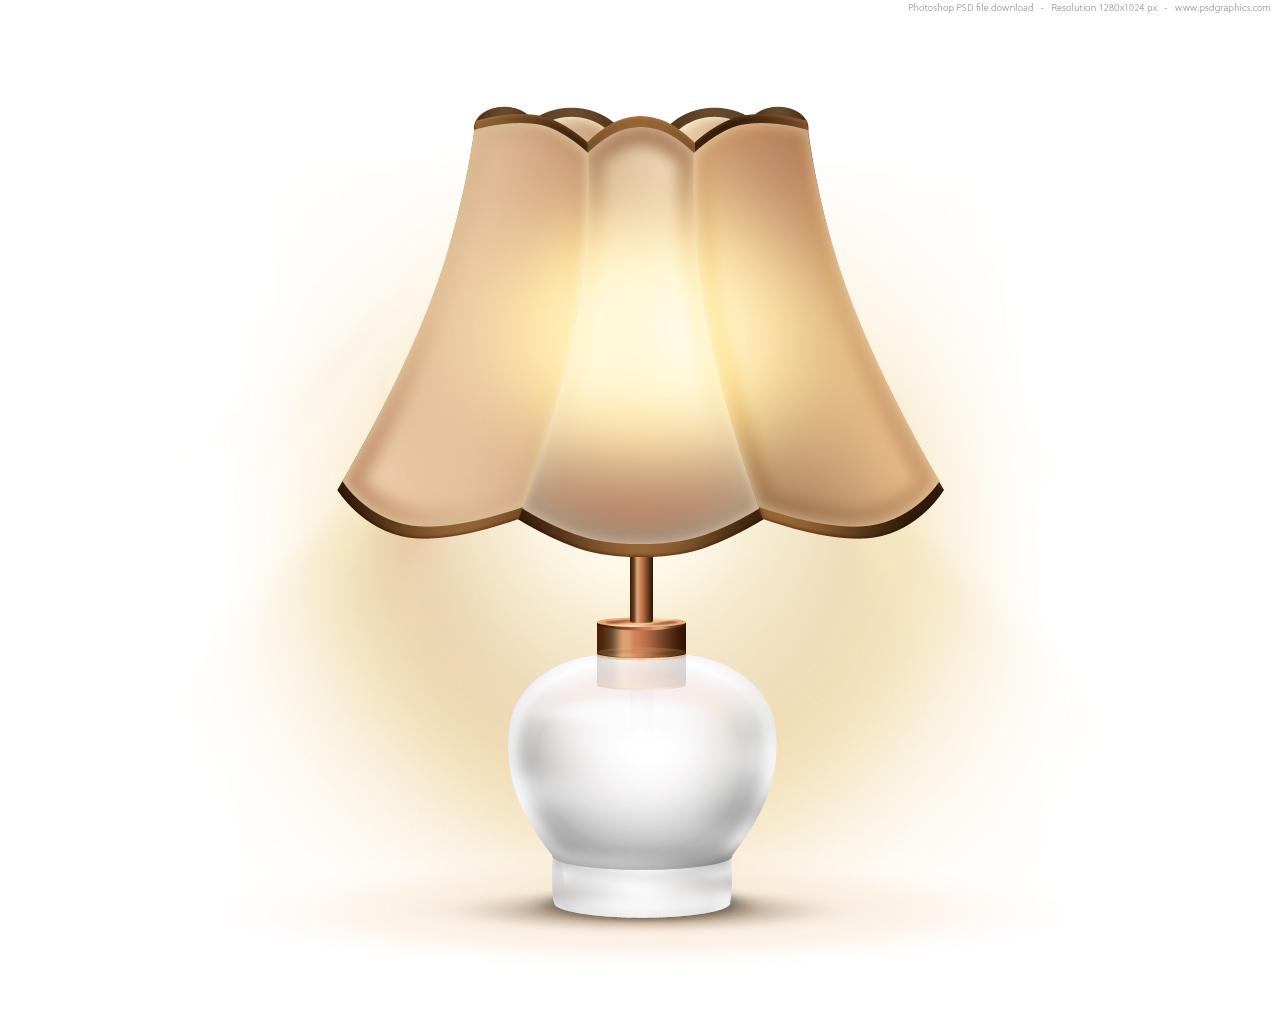 white lamp table photo - 3